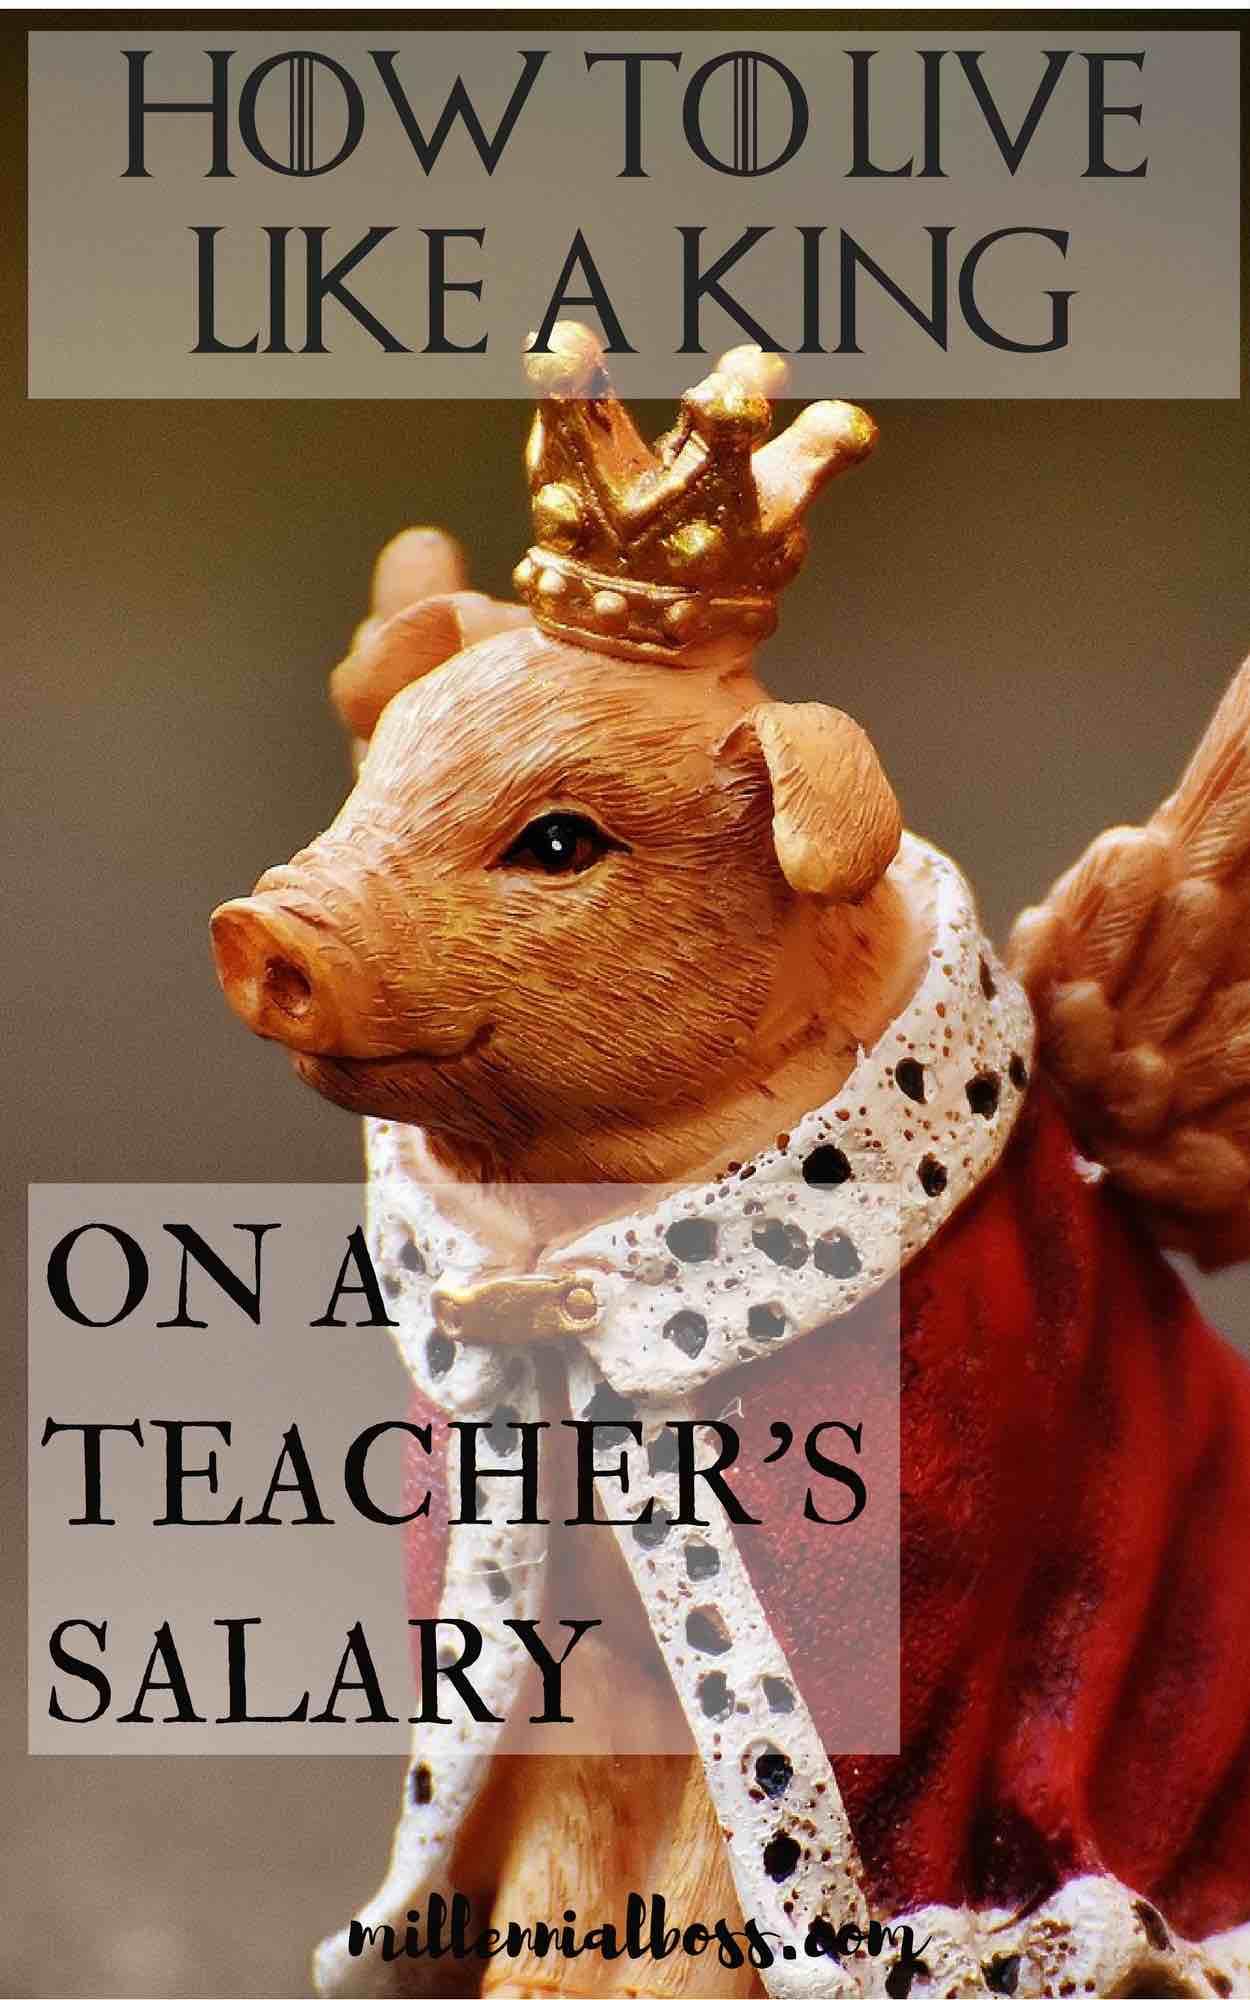 How to Live Like a King on Teacher's Salary